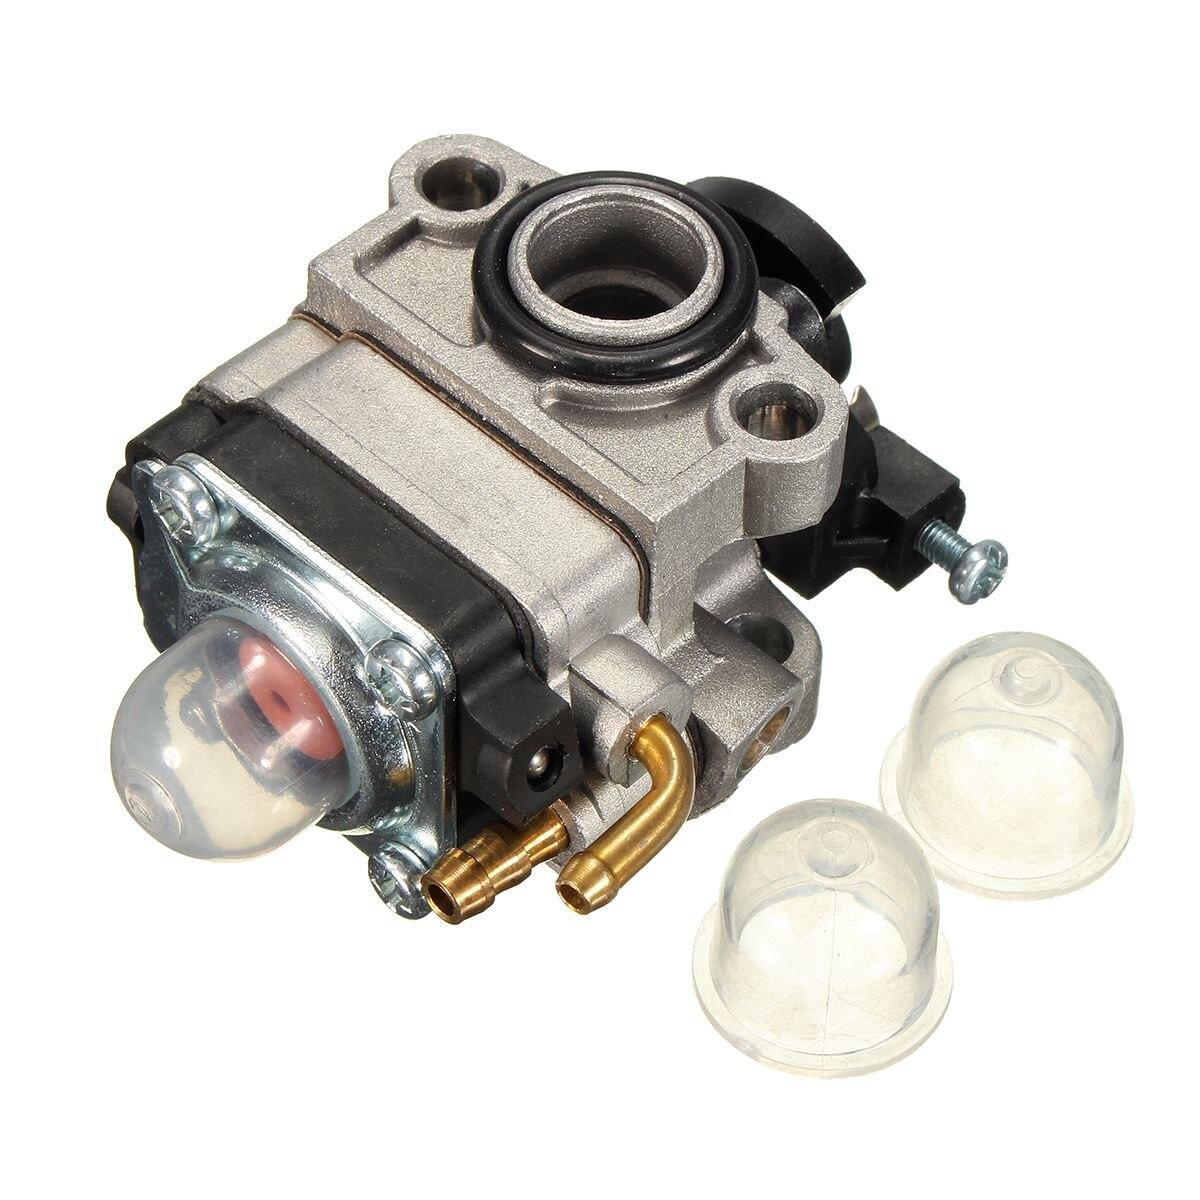 Carburadores para troy-bilt/tb575ss/tb525cs/trimmer/cultivador 753-04745 753-1225 aluminio plástico de cobre